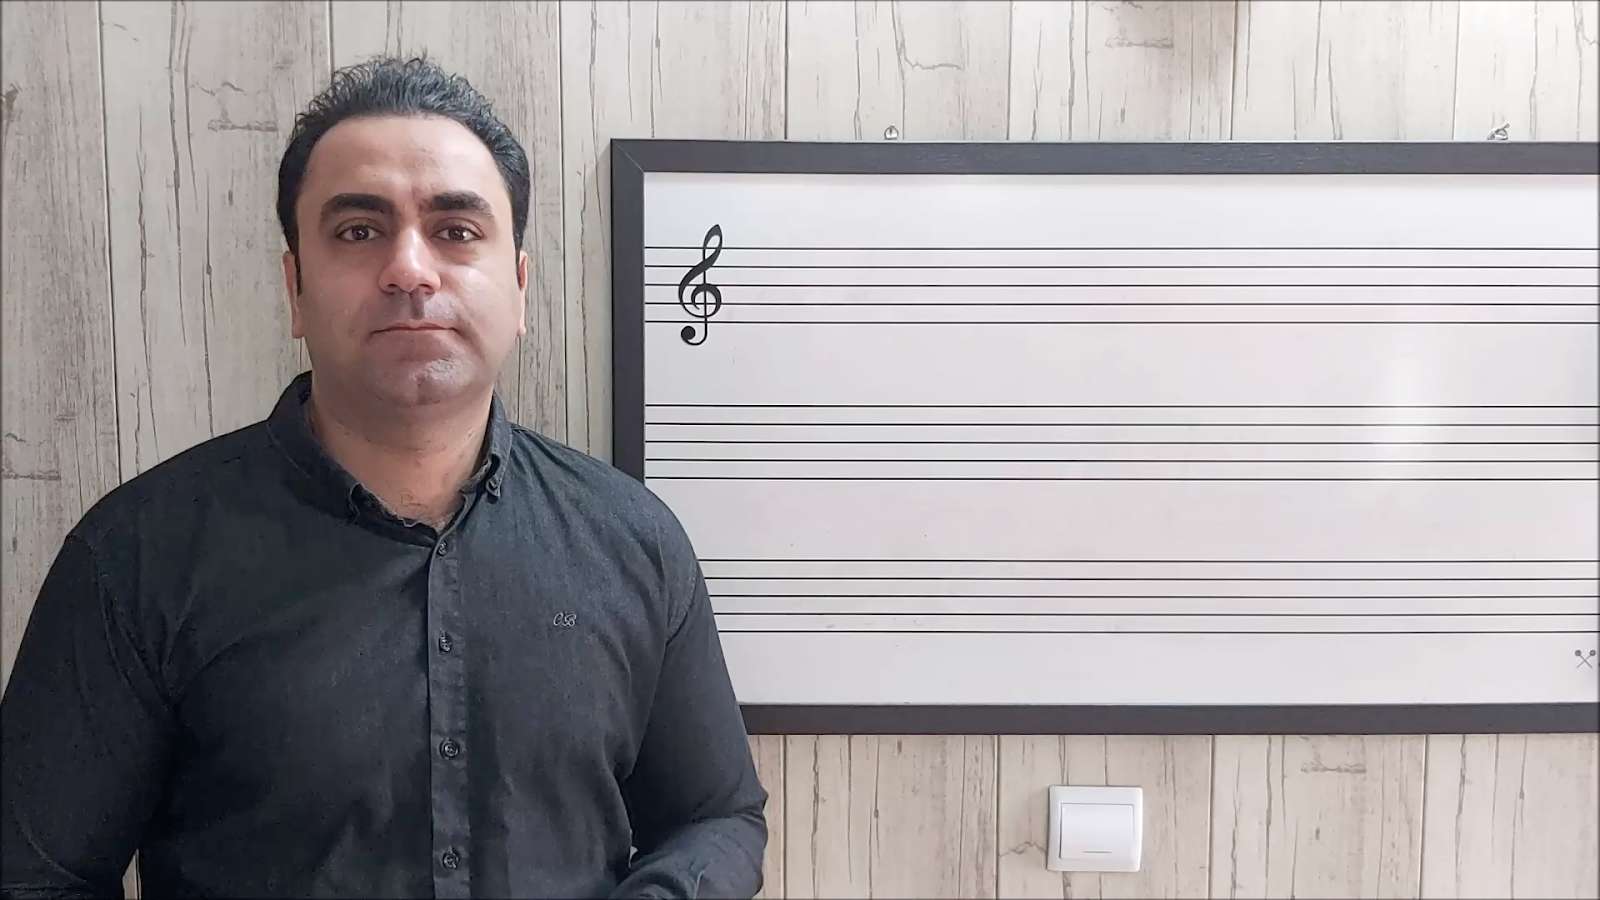 سکوت فصل یک تئوری موسیقی پرویز منصوری ایمان ملکی